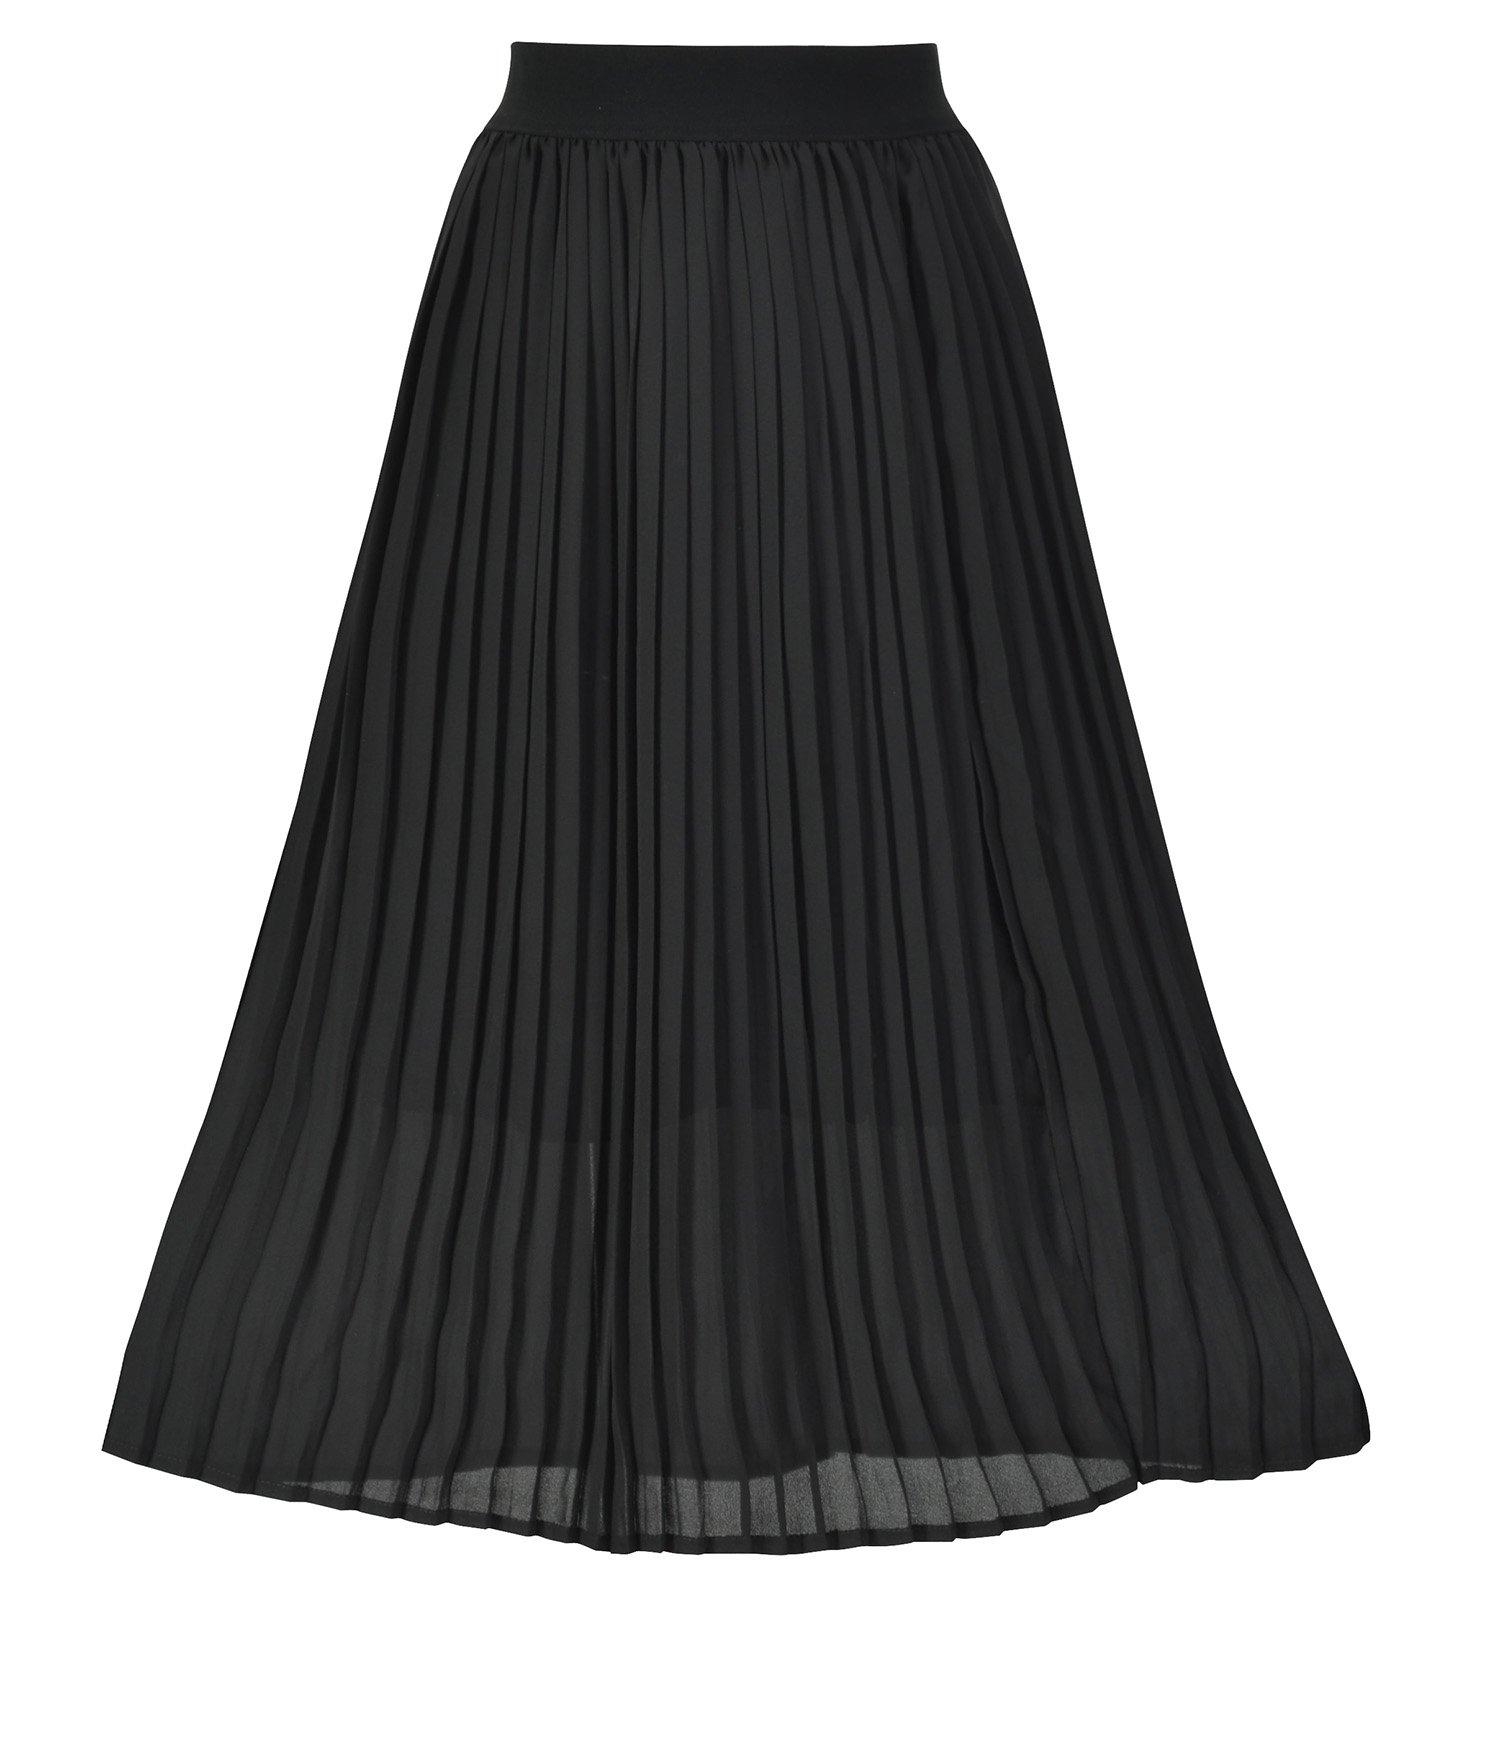 Howriis Women's Summer Chiffon Pleated A-Line Midi Skirt Dress (4-6, Black)